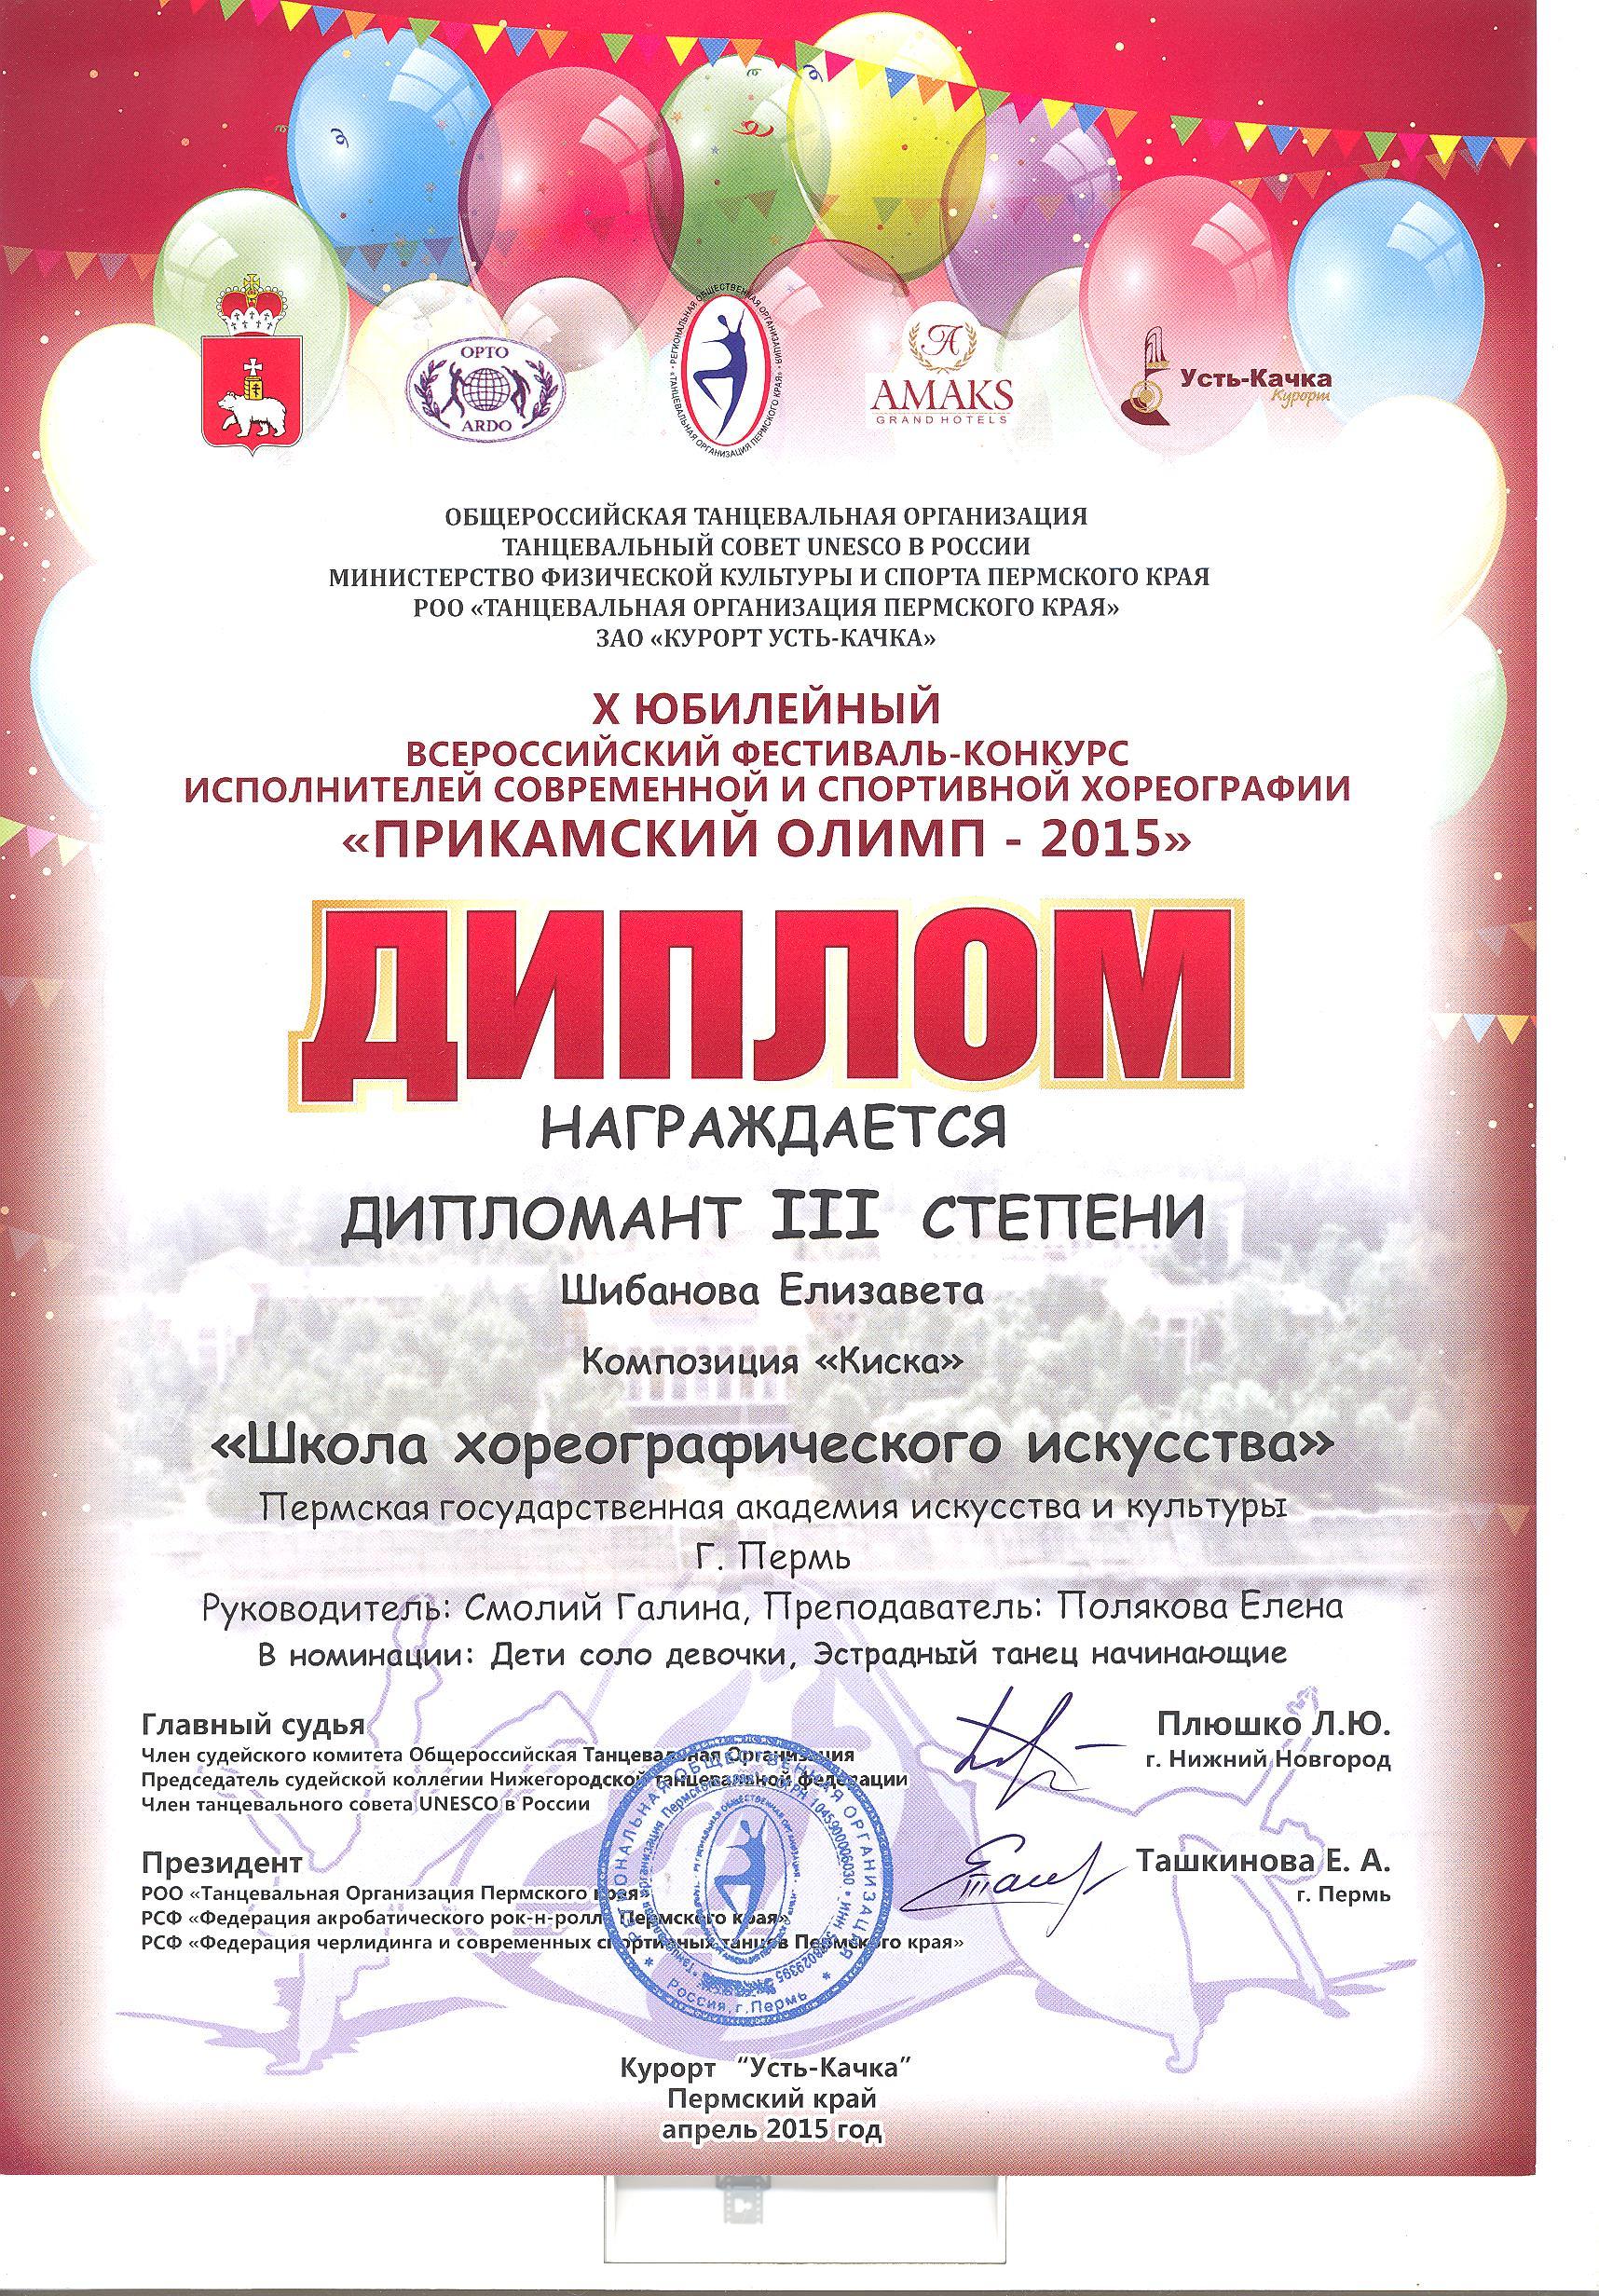 ШИбанова Е. - диплом.jpg